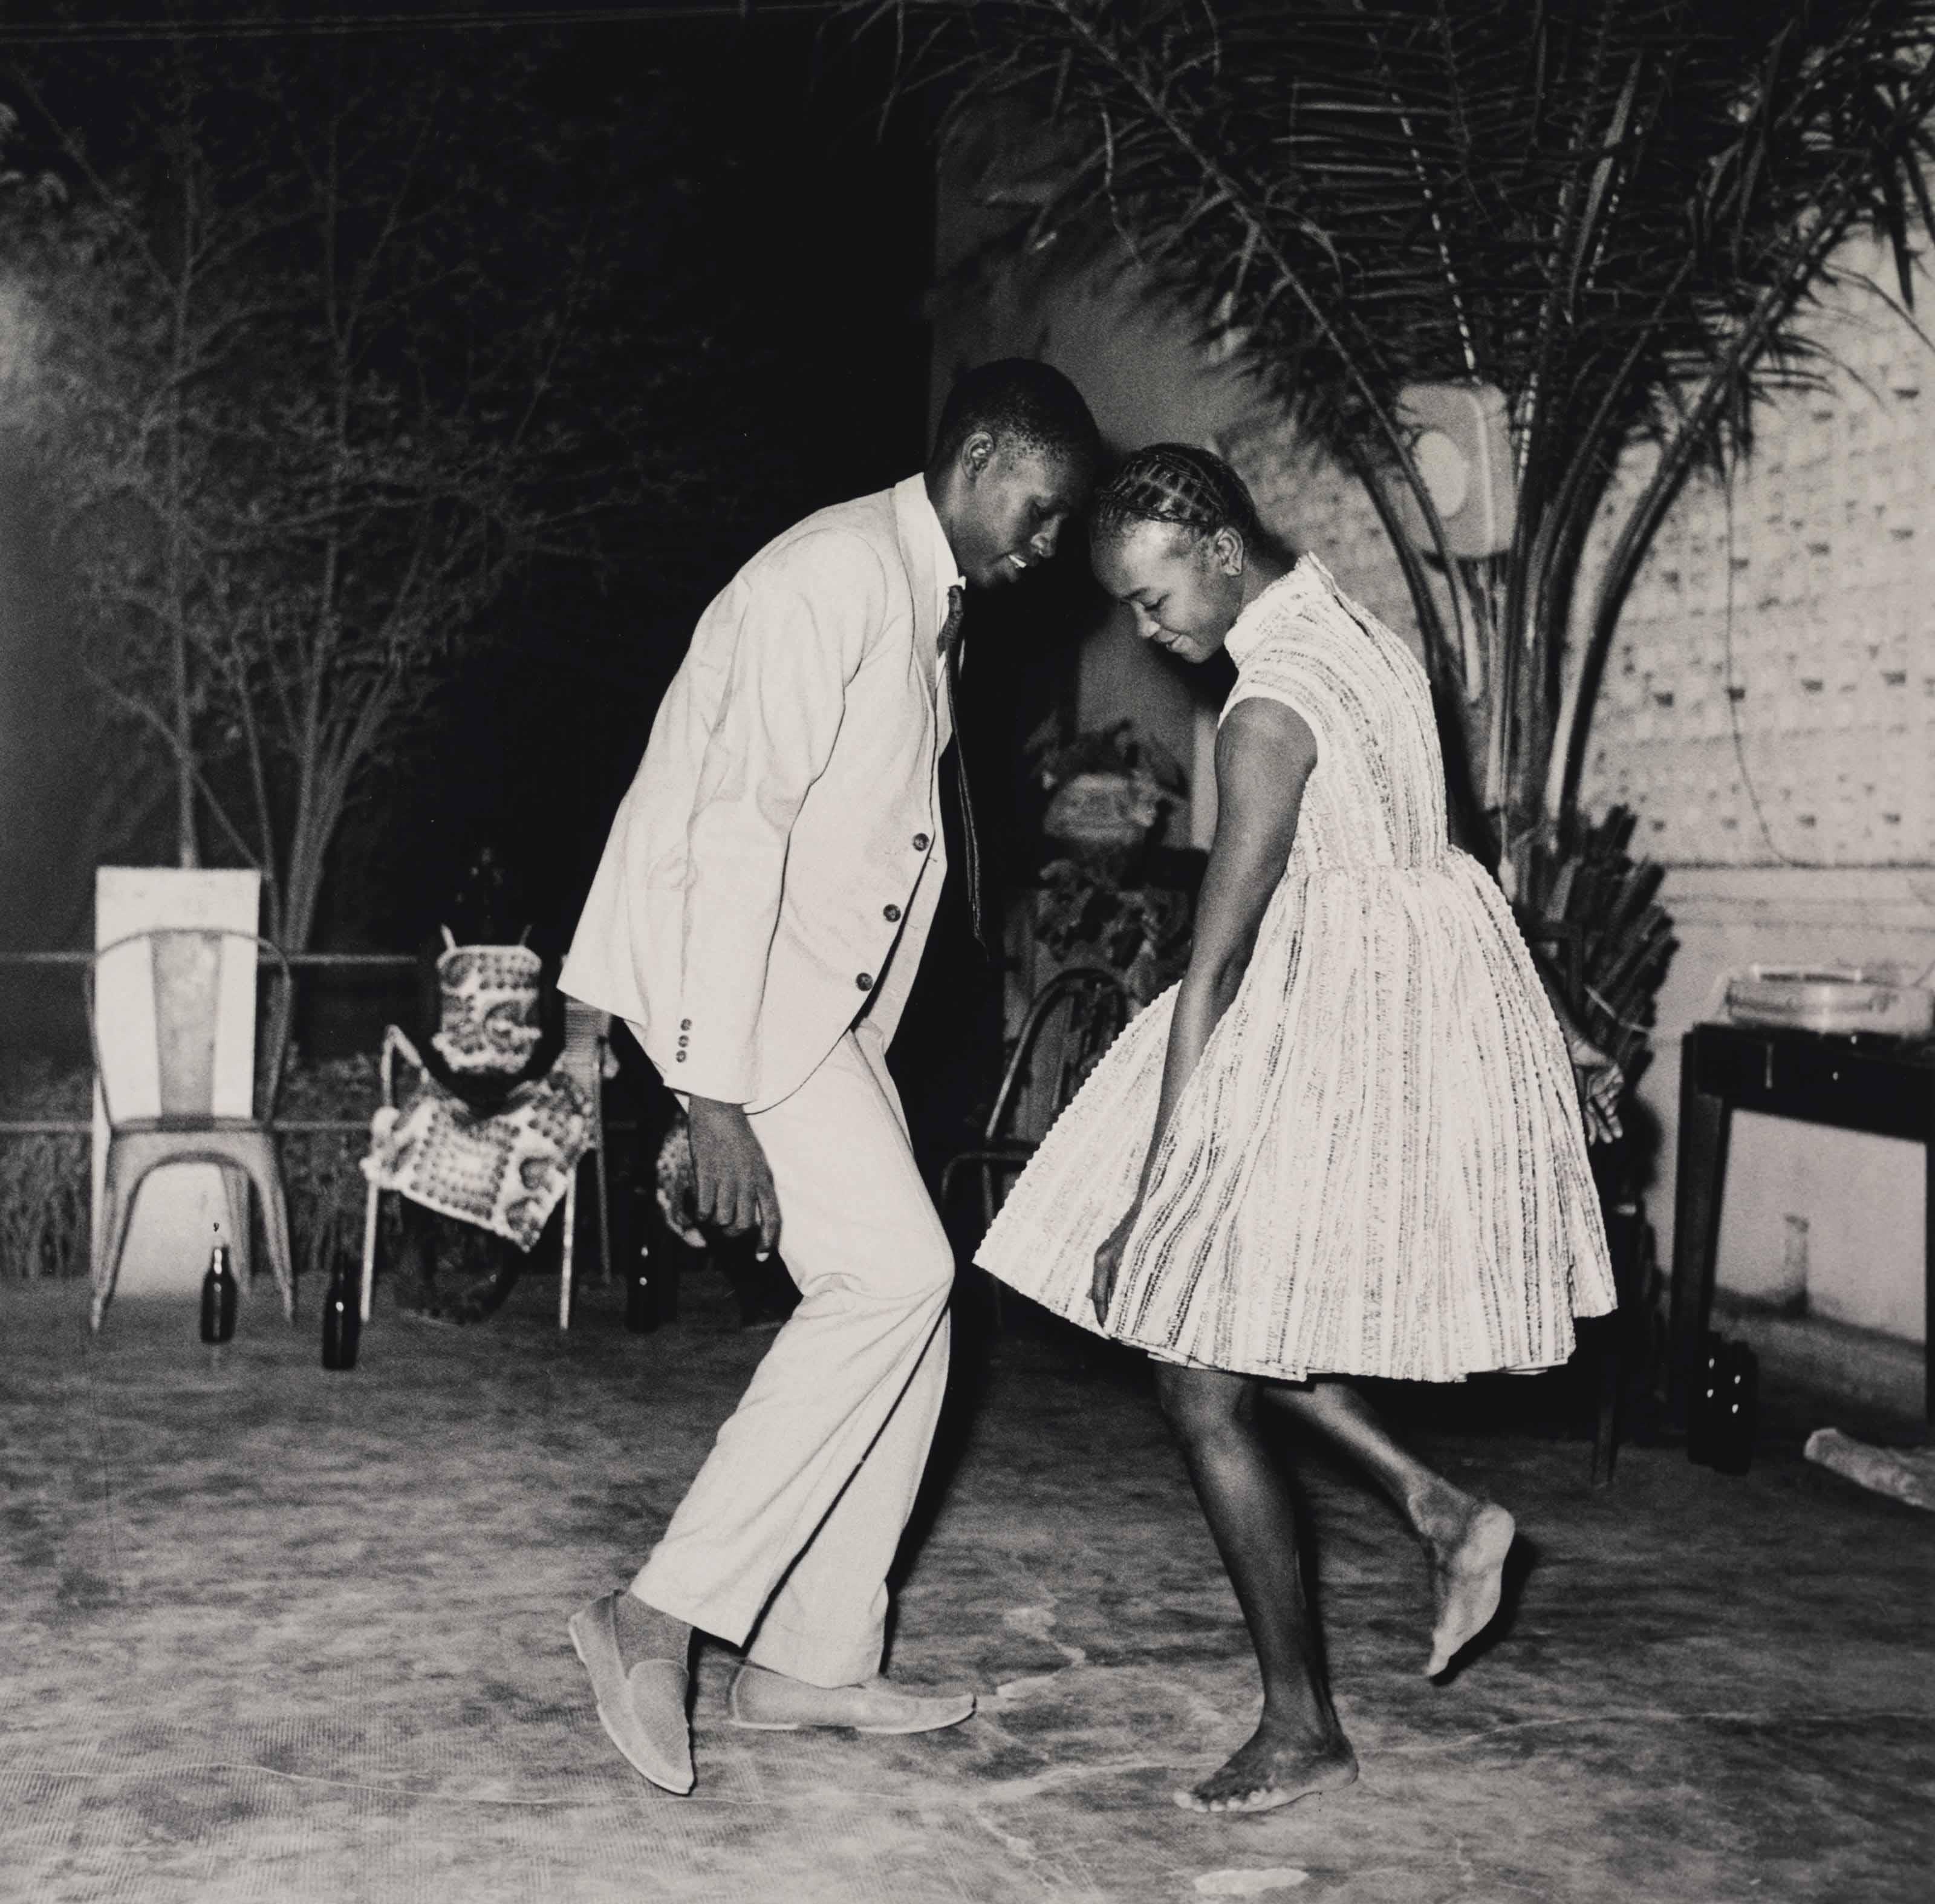 Nuit de Noël, 1963